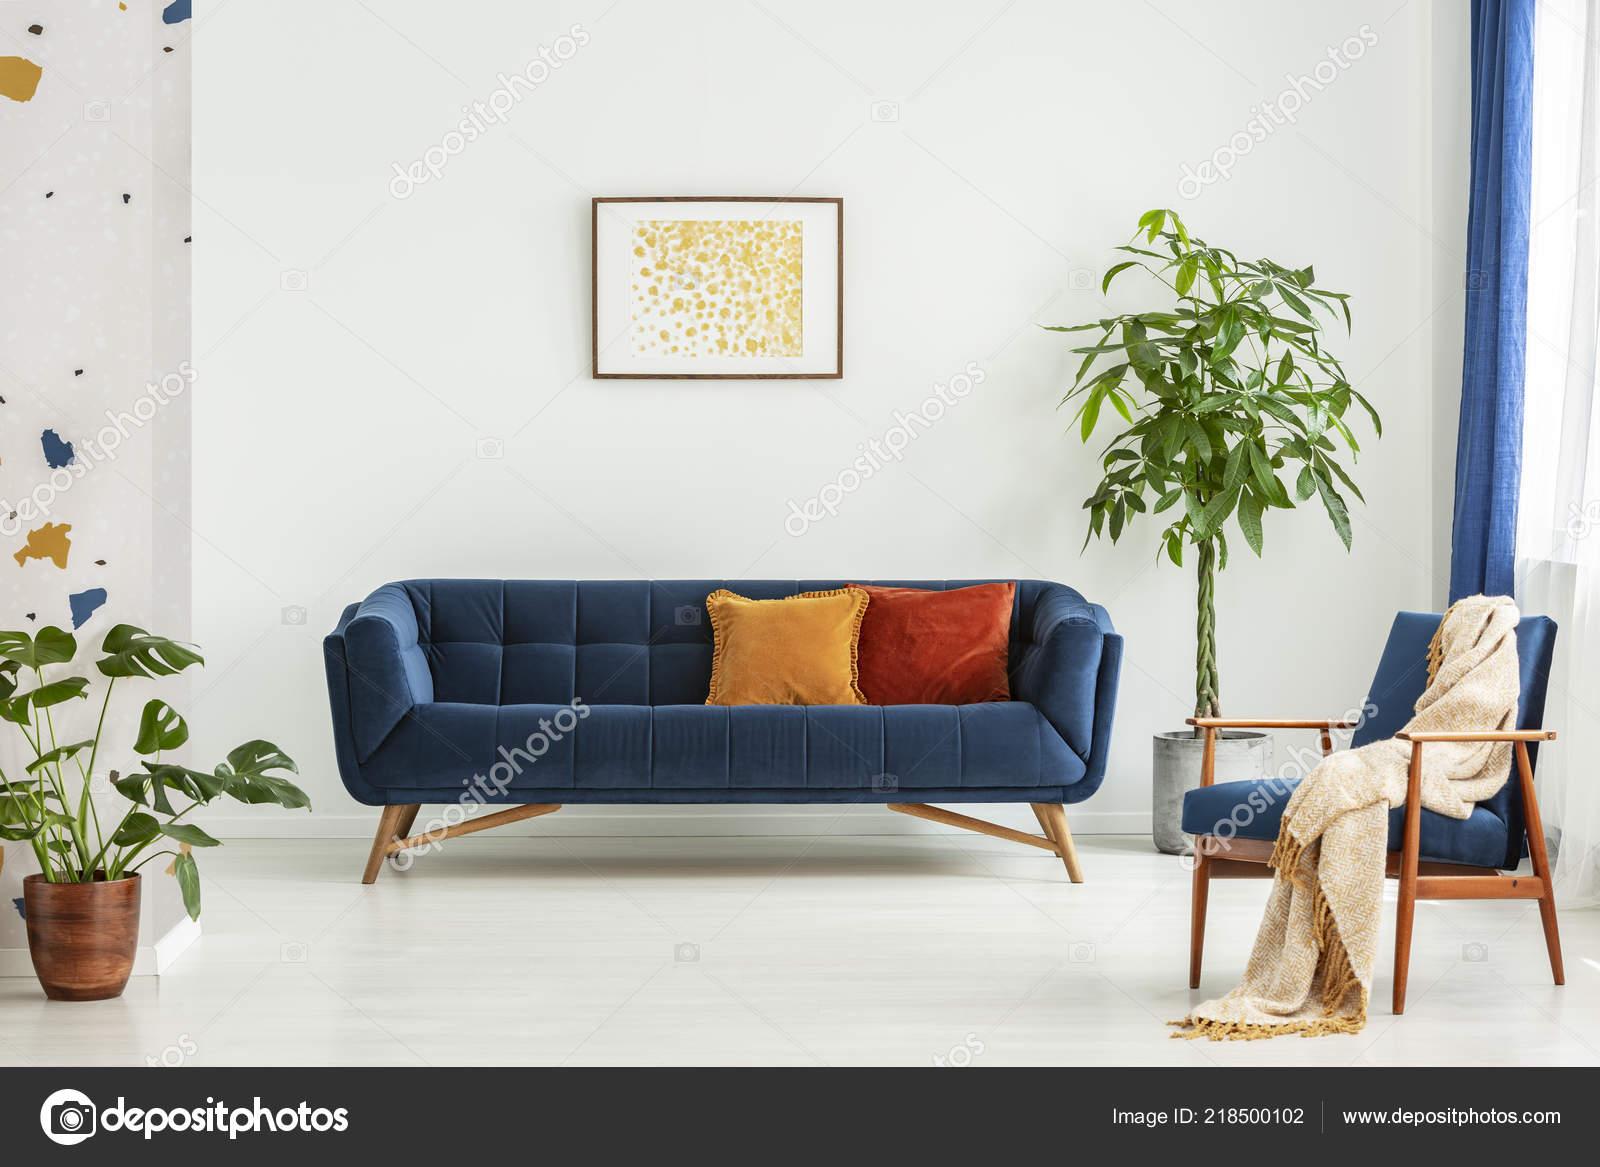 Marvelous Mid Century Modern Chair Blanket Large Sofa Colorful Ibusinesslaw Wood Chair Design Ideas Ibusinesslaworg